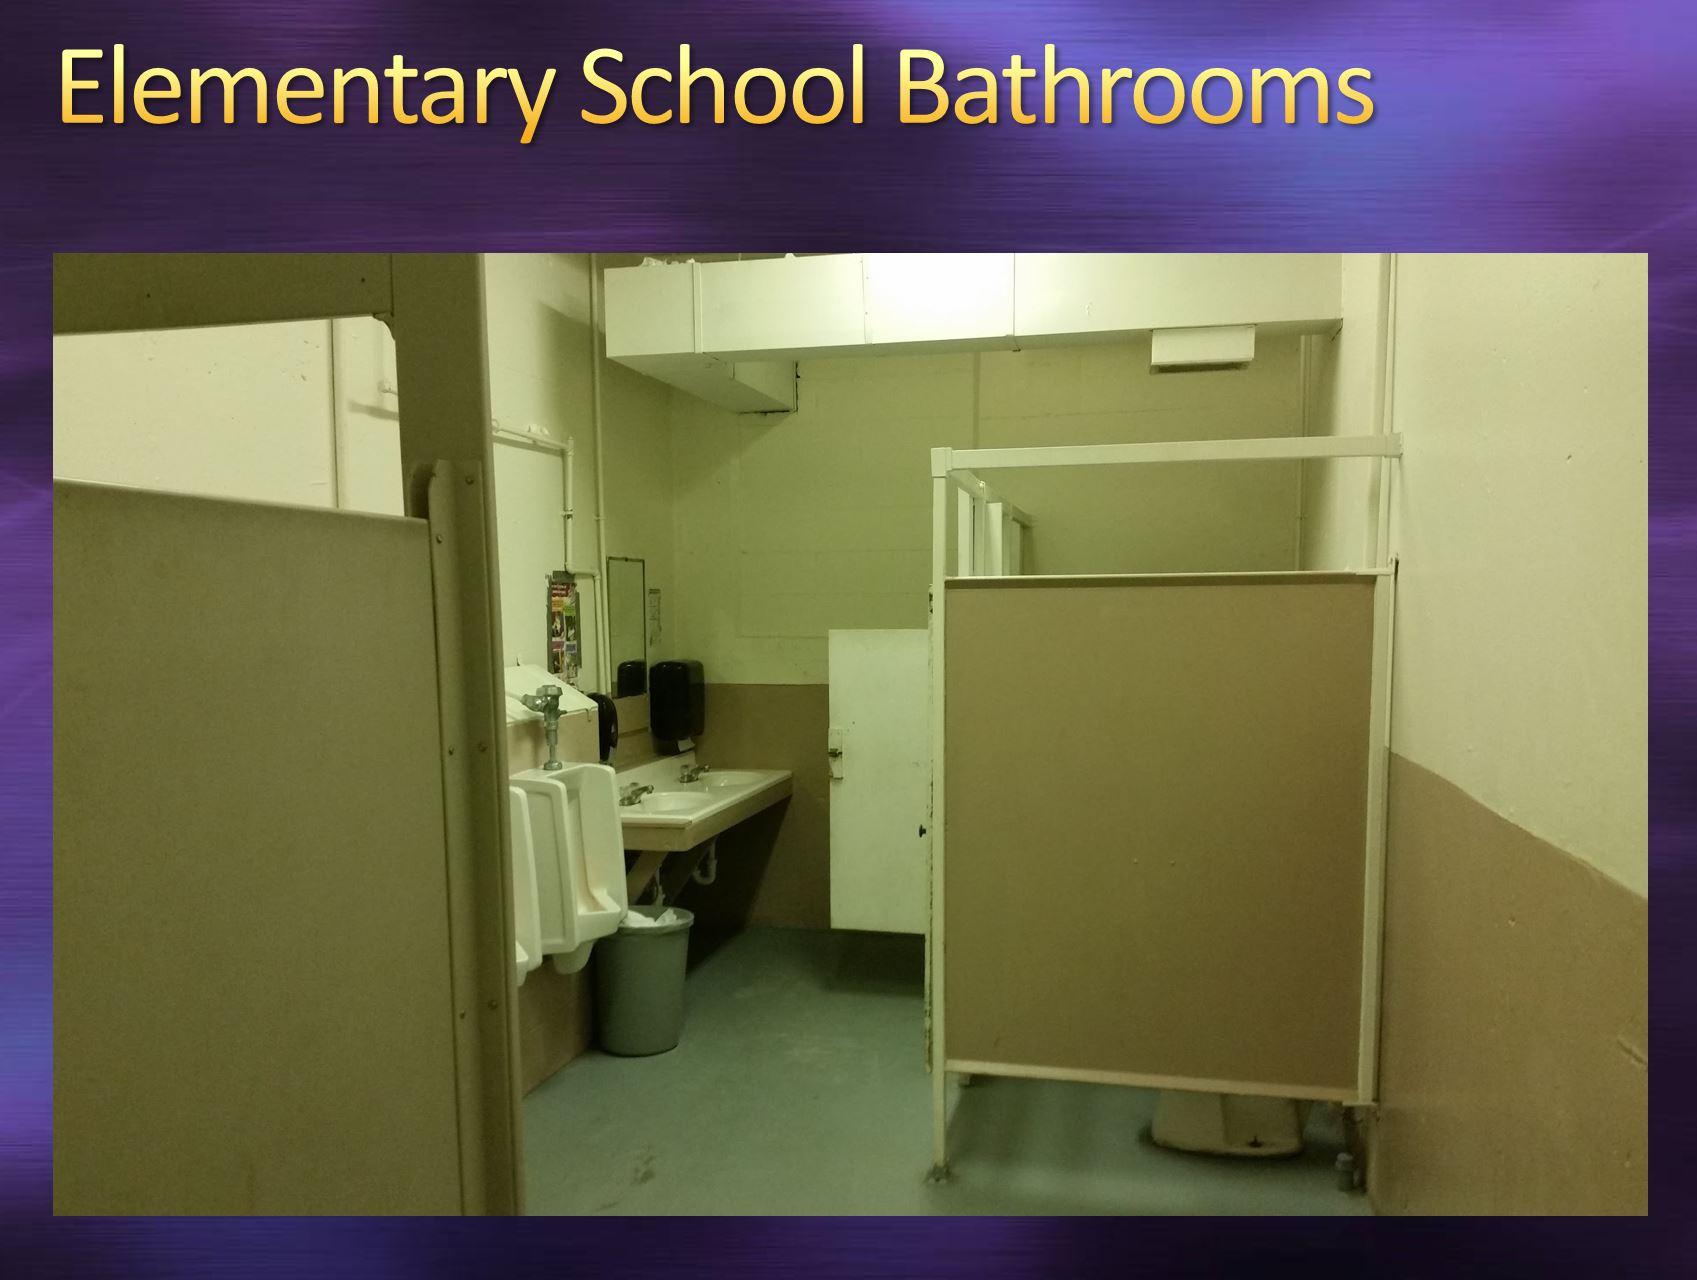 Elementary School Bathrooms